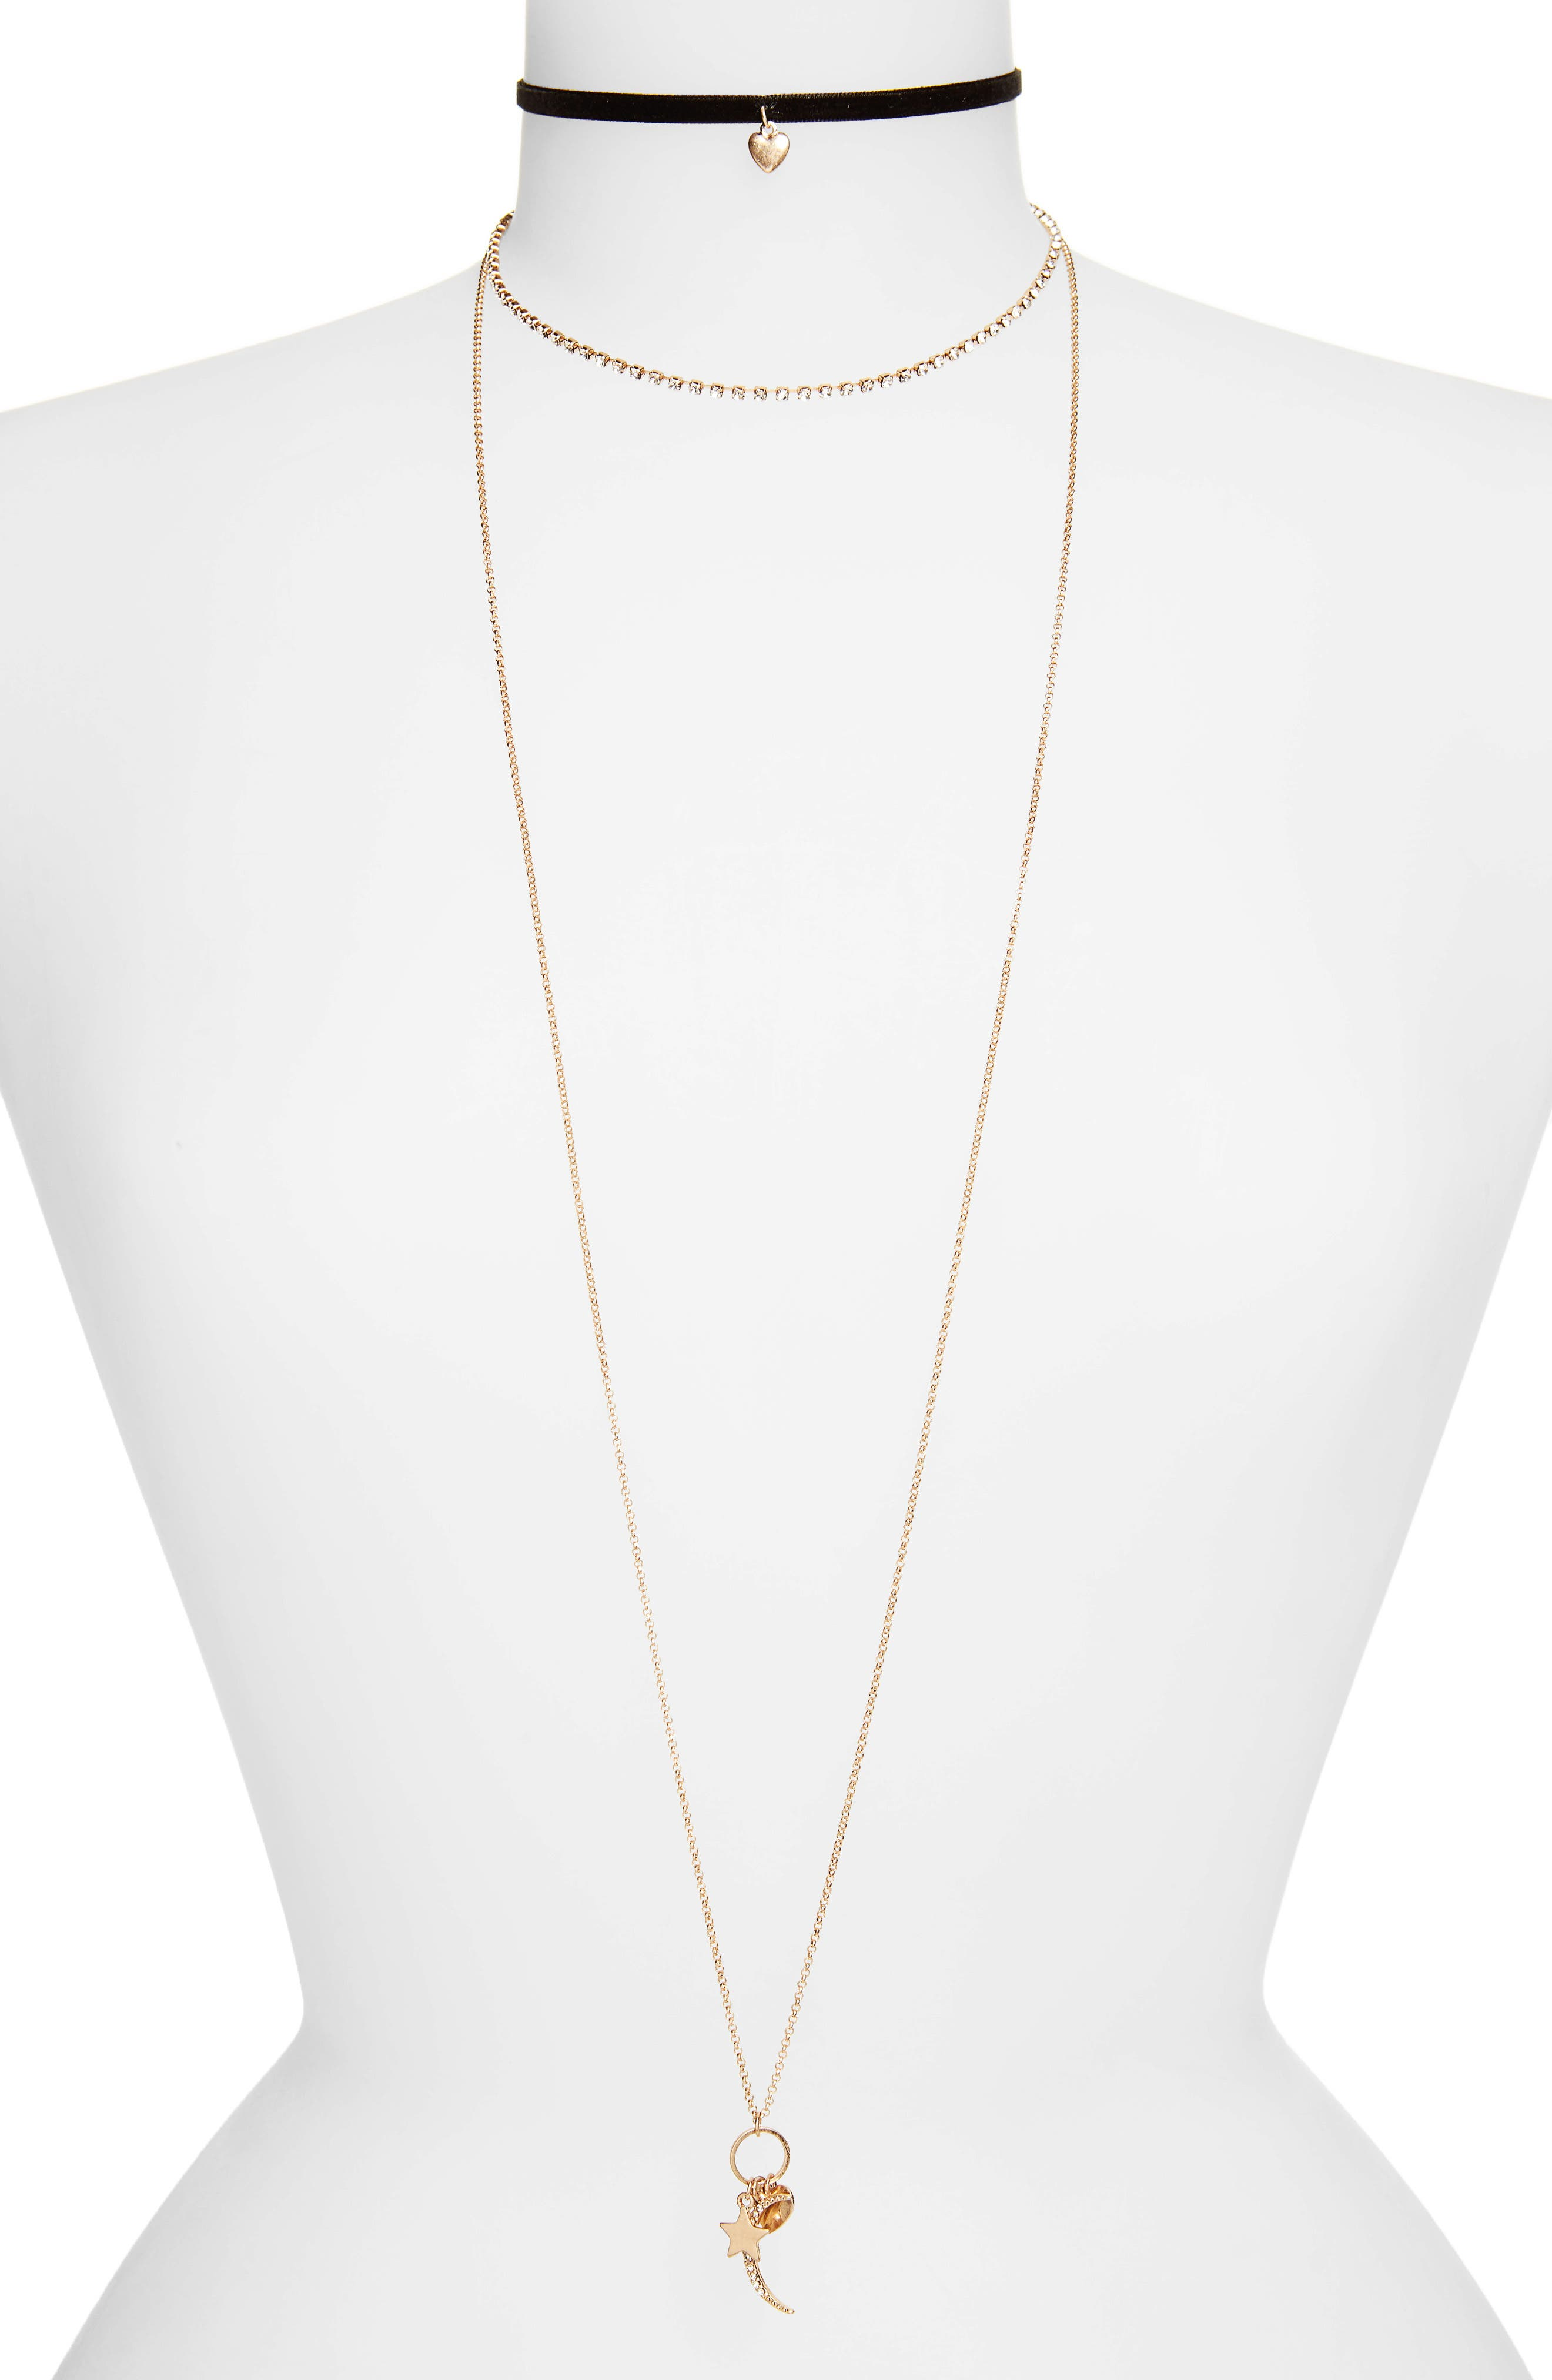 Topshop Hearts & Star Necklaces (Set of 2)